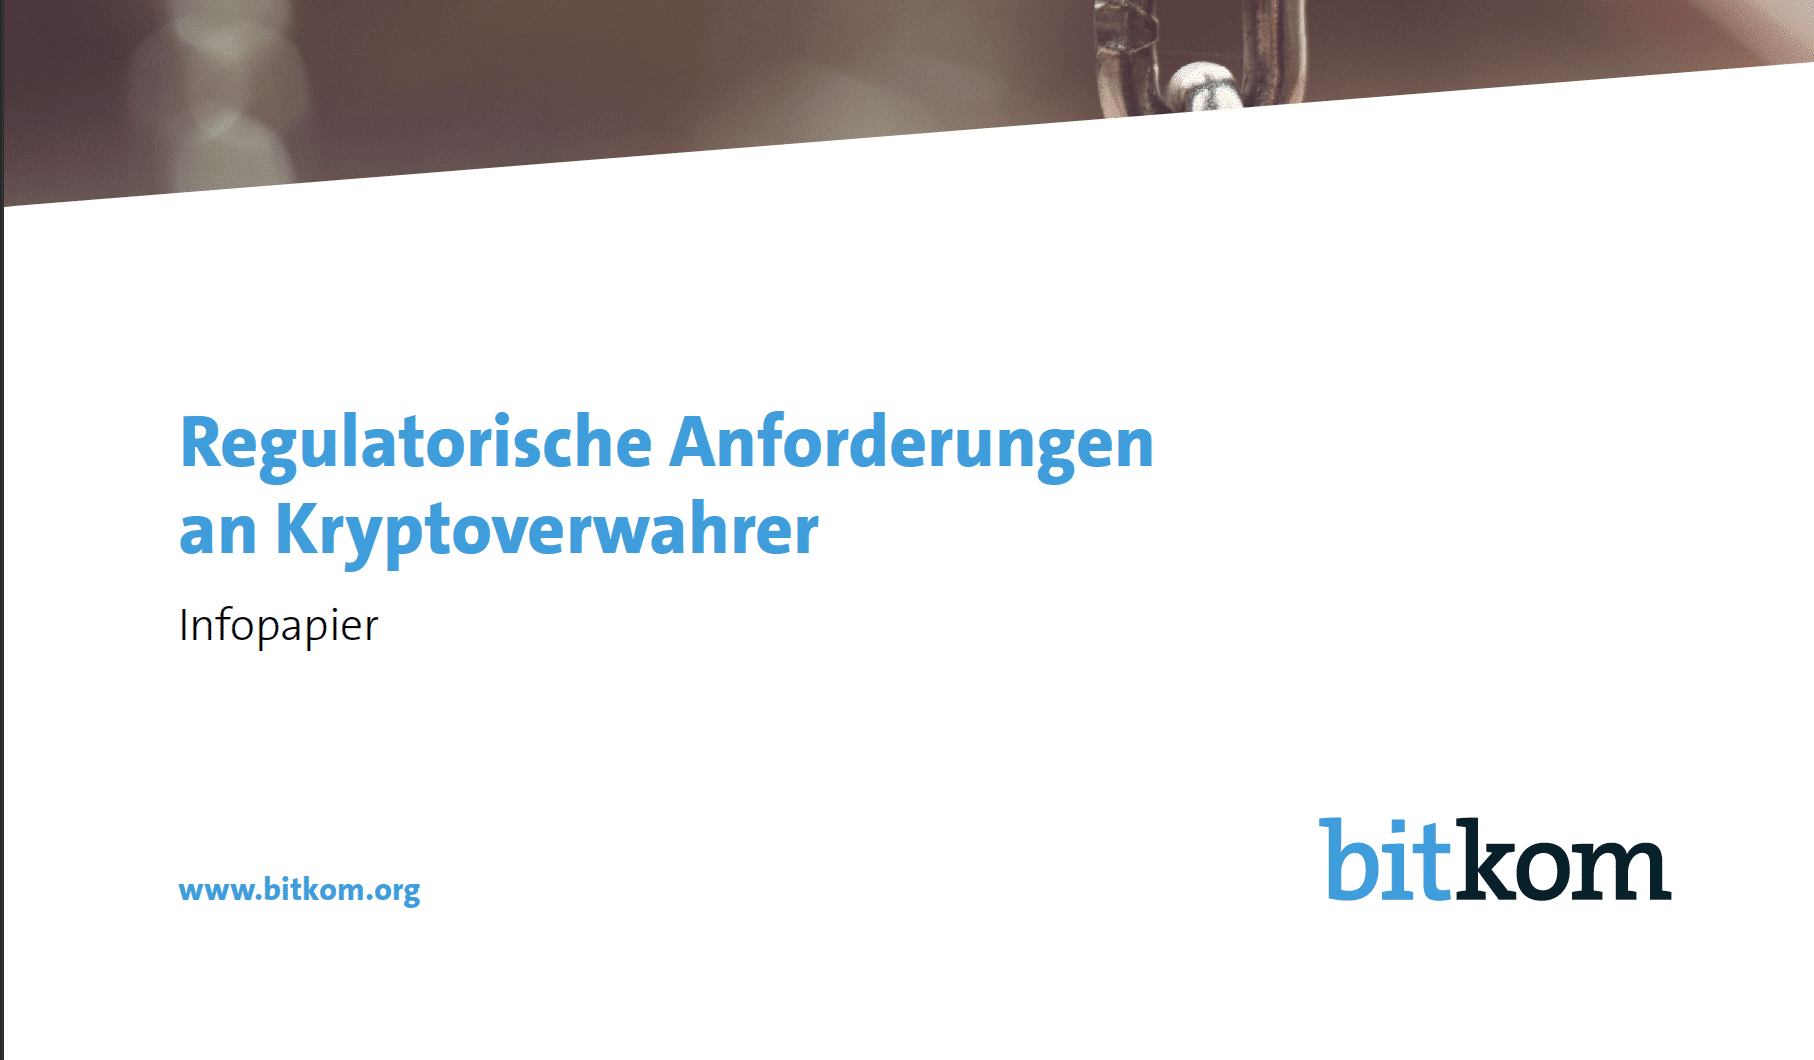 Bitkom Infopapier - Regulatorische Anforderungen an Kryptoverwahrer / Financial regulators are watching crypto custodians